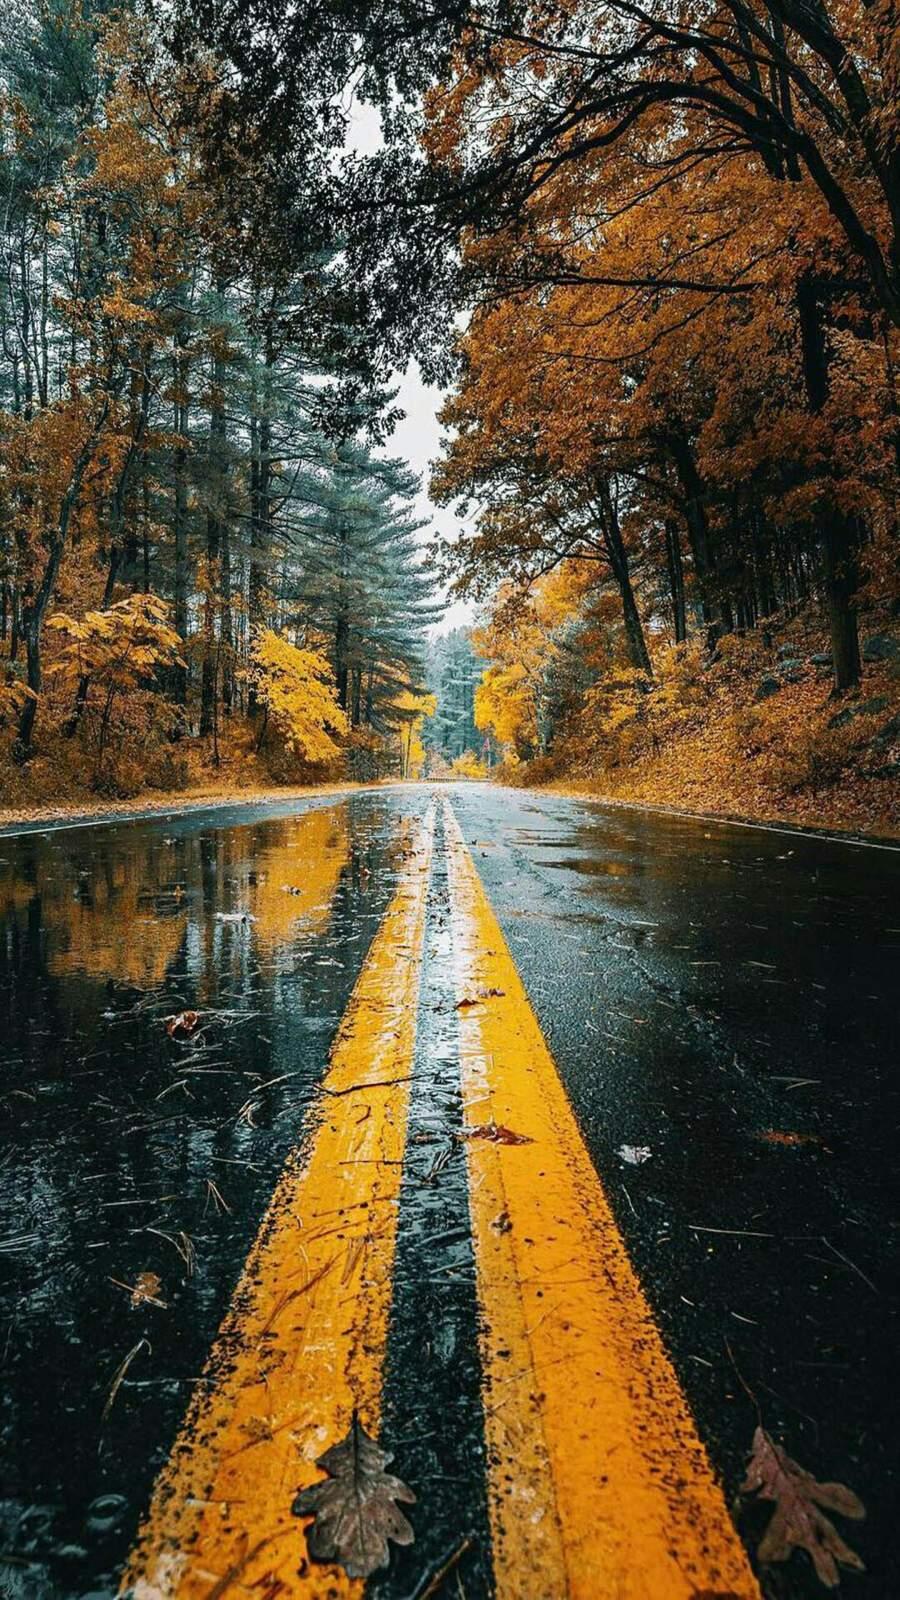 Autumn Wet Road Reflection iPhone Wallpaper